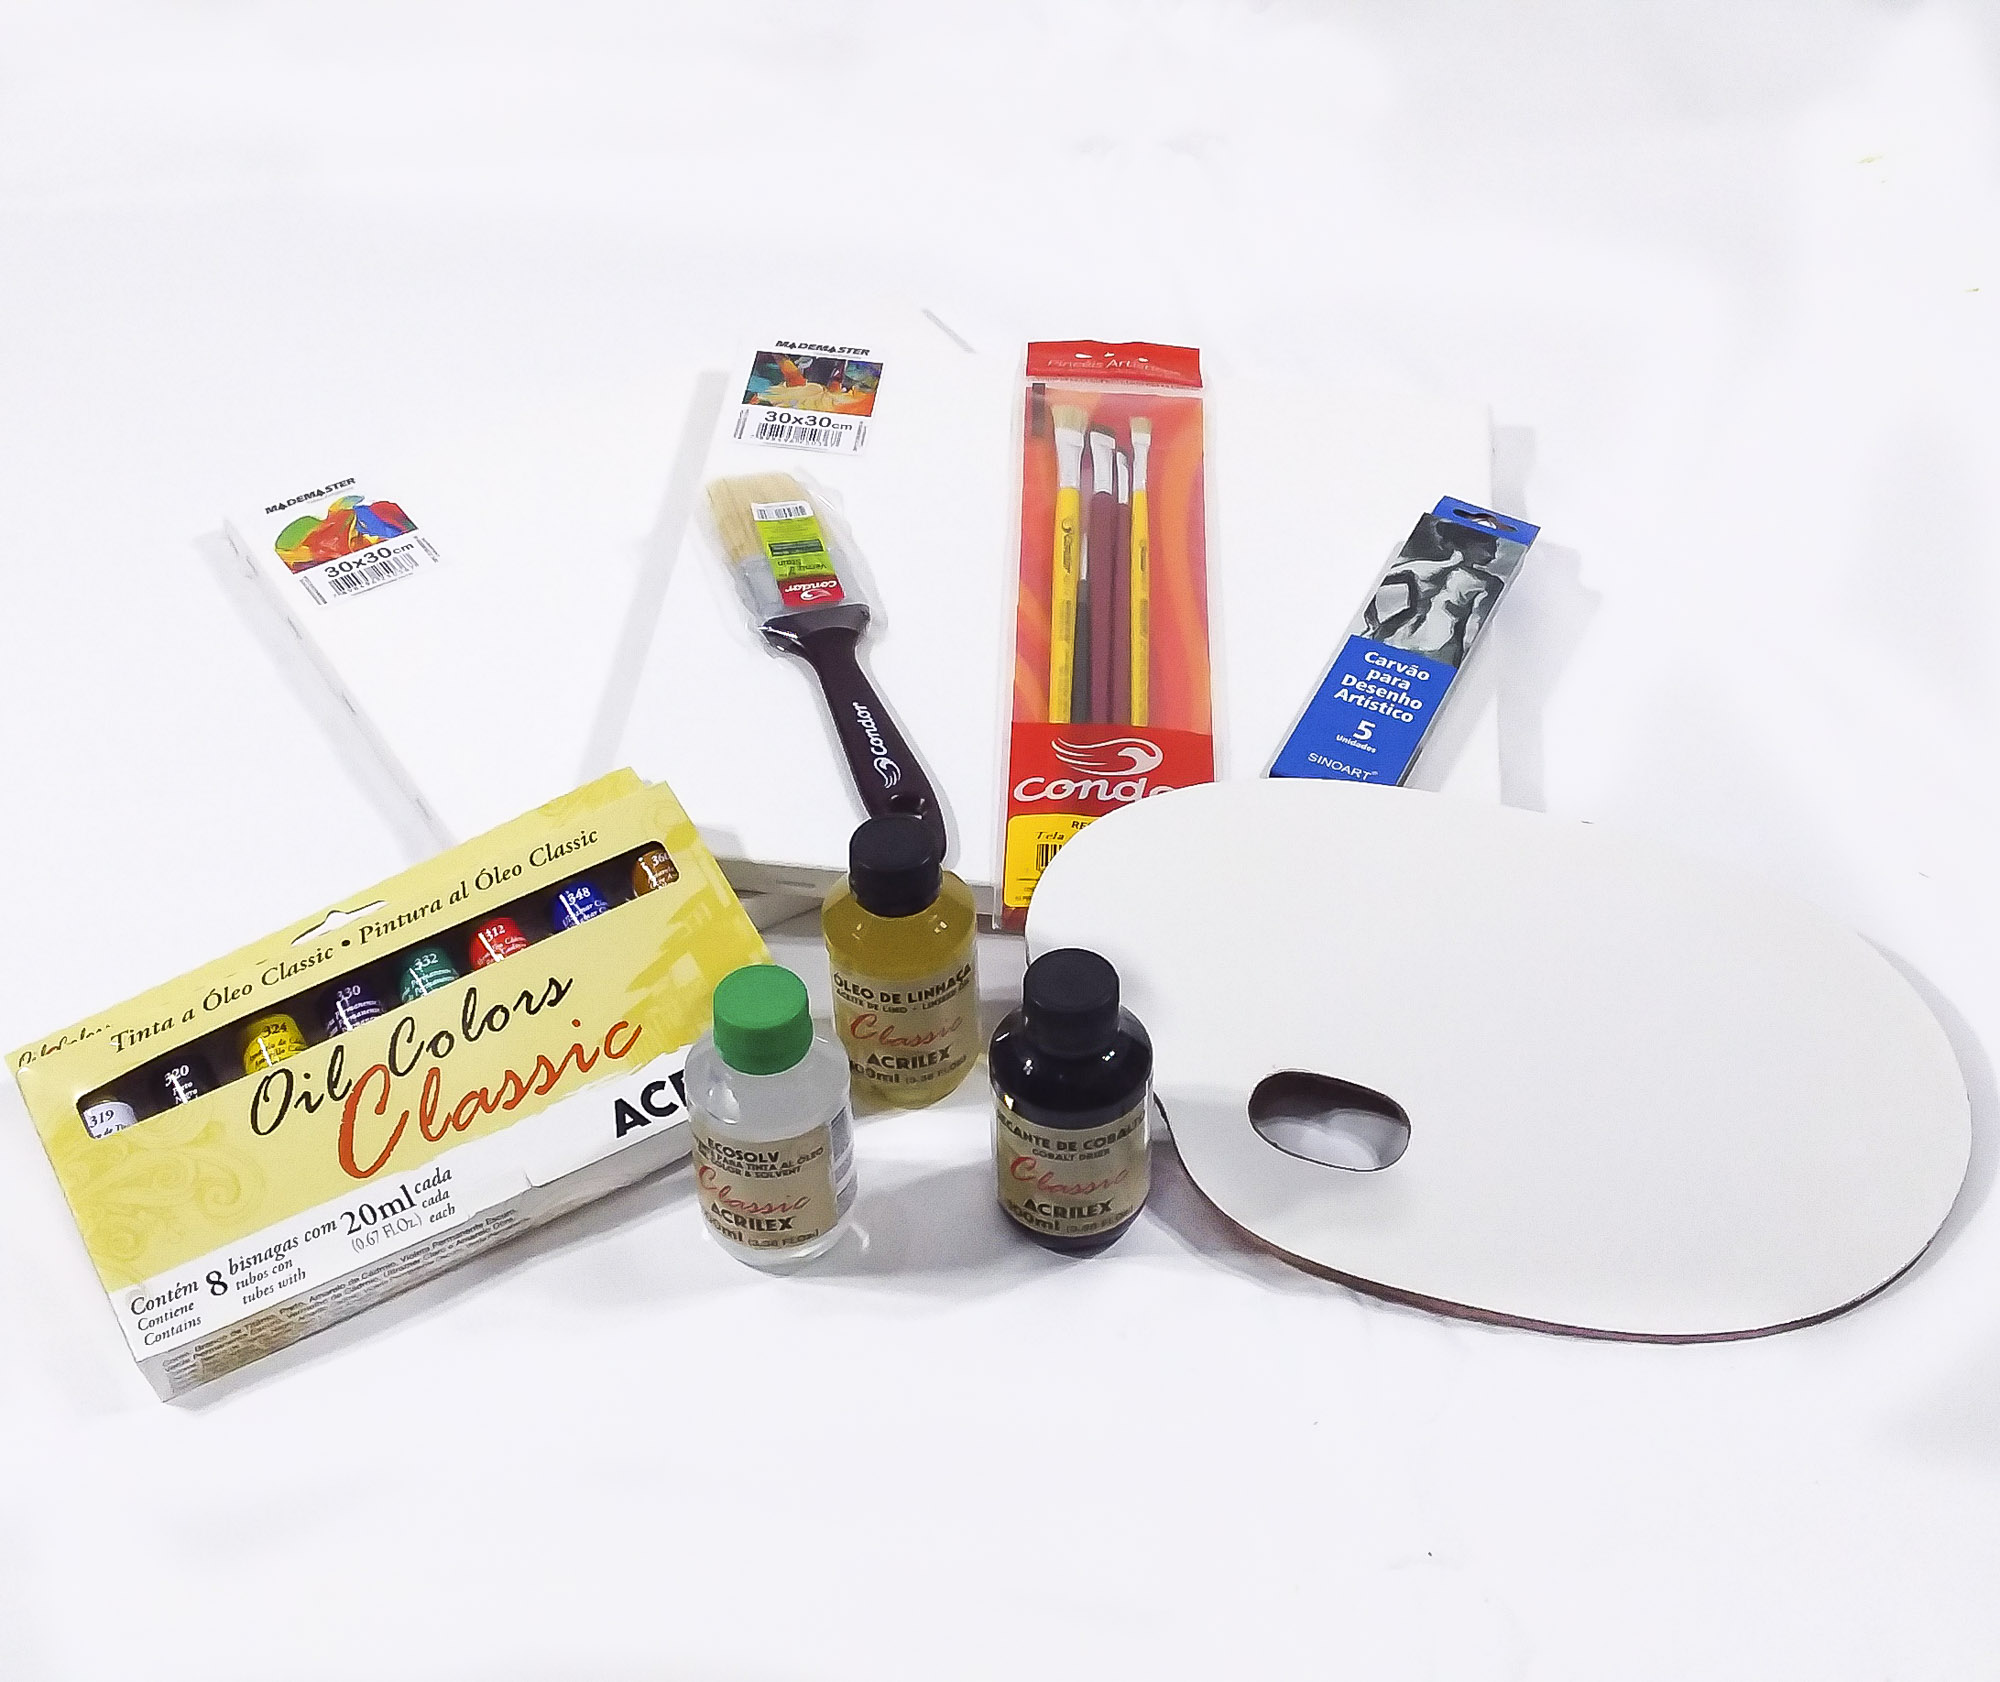 Kit óleo iniciante - 2 telas 30x30